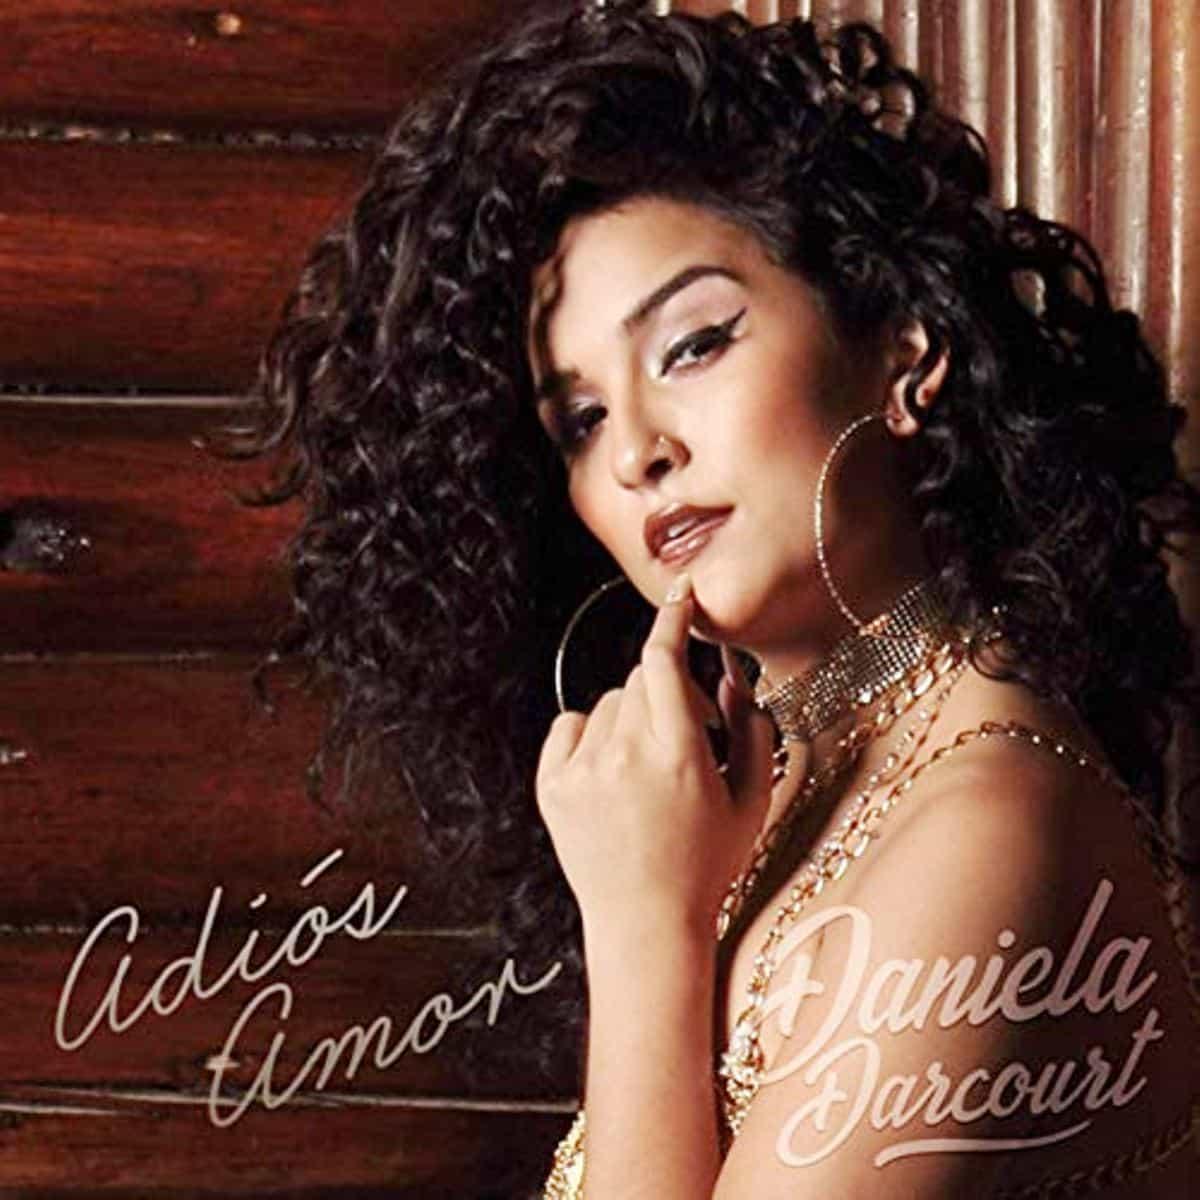 Salsa-Musik von Daniela Carcourt Album Adios Amor